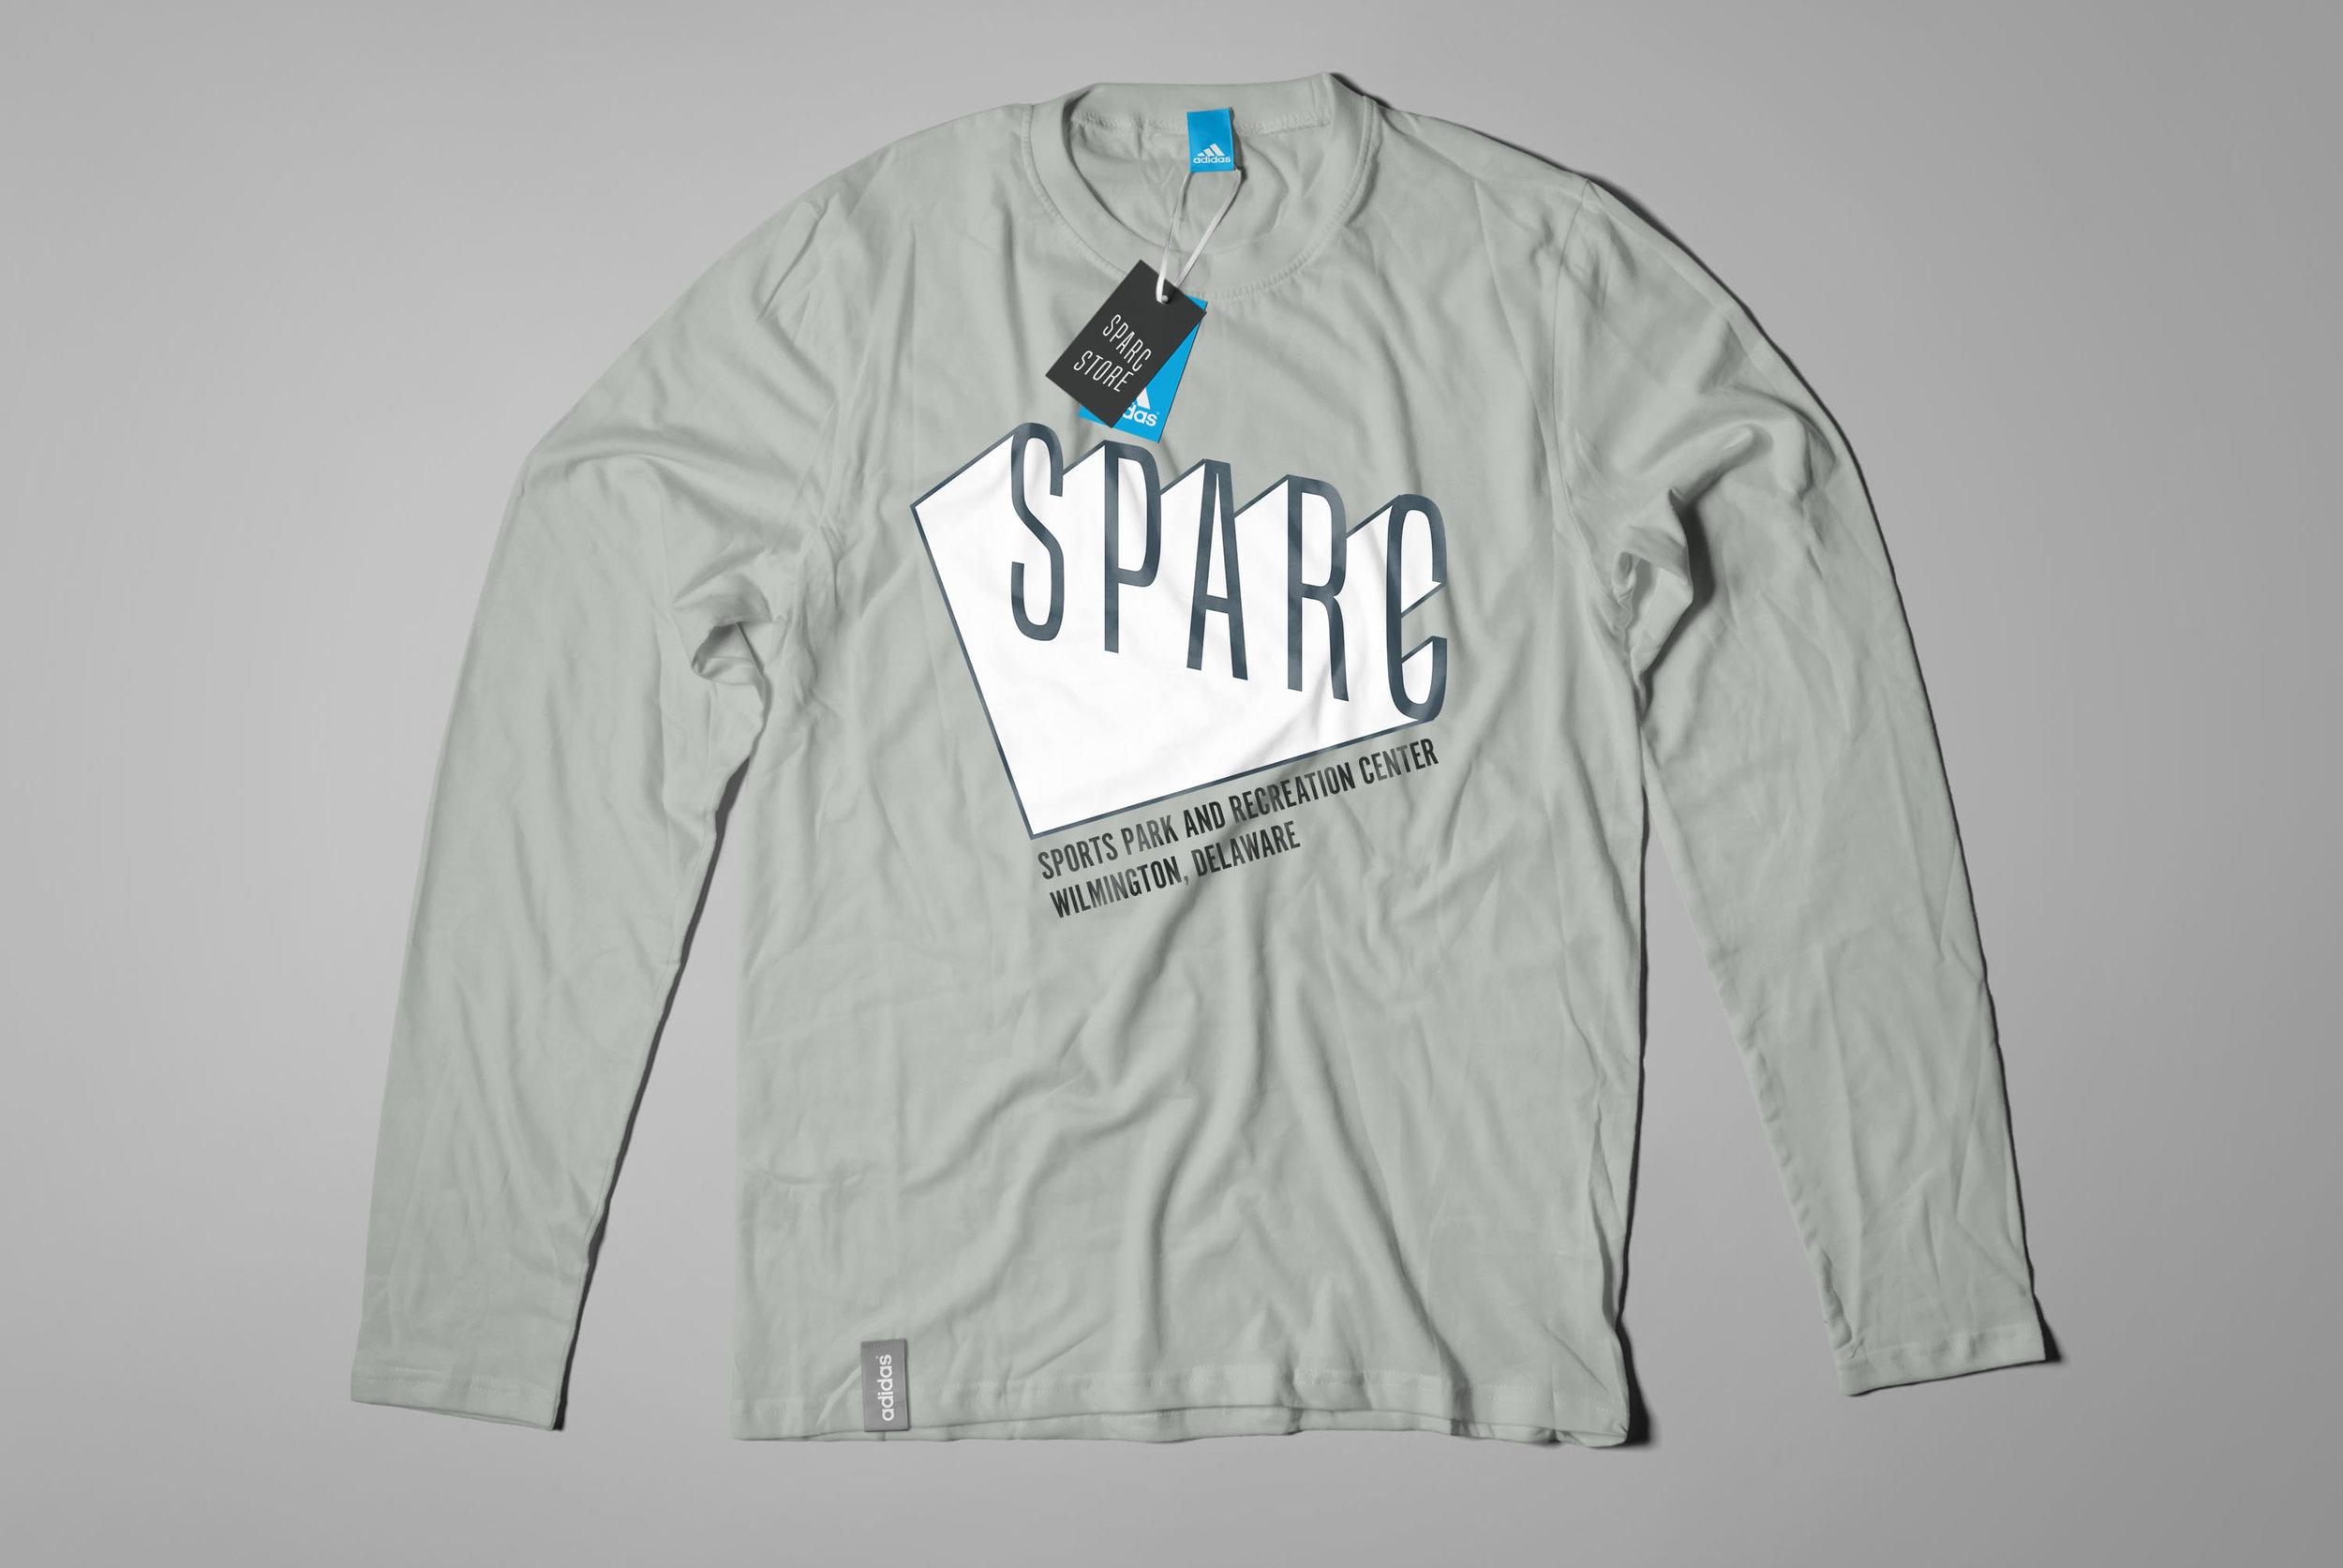 sparc_long shirt mock up.jpg